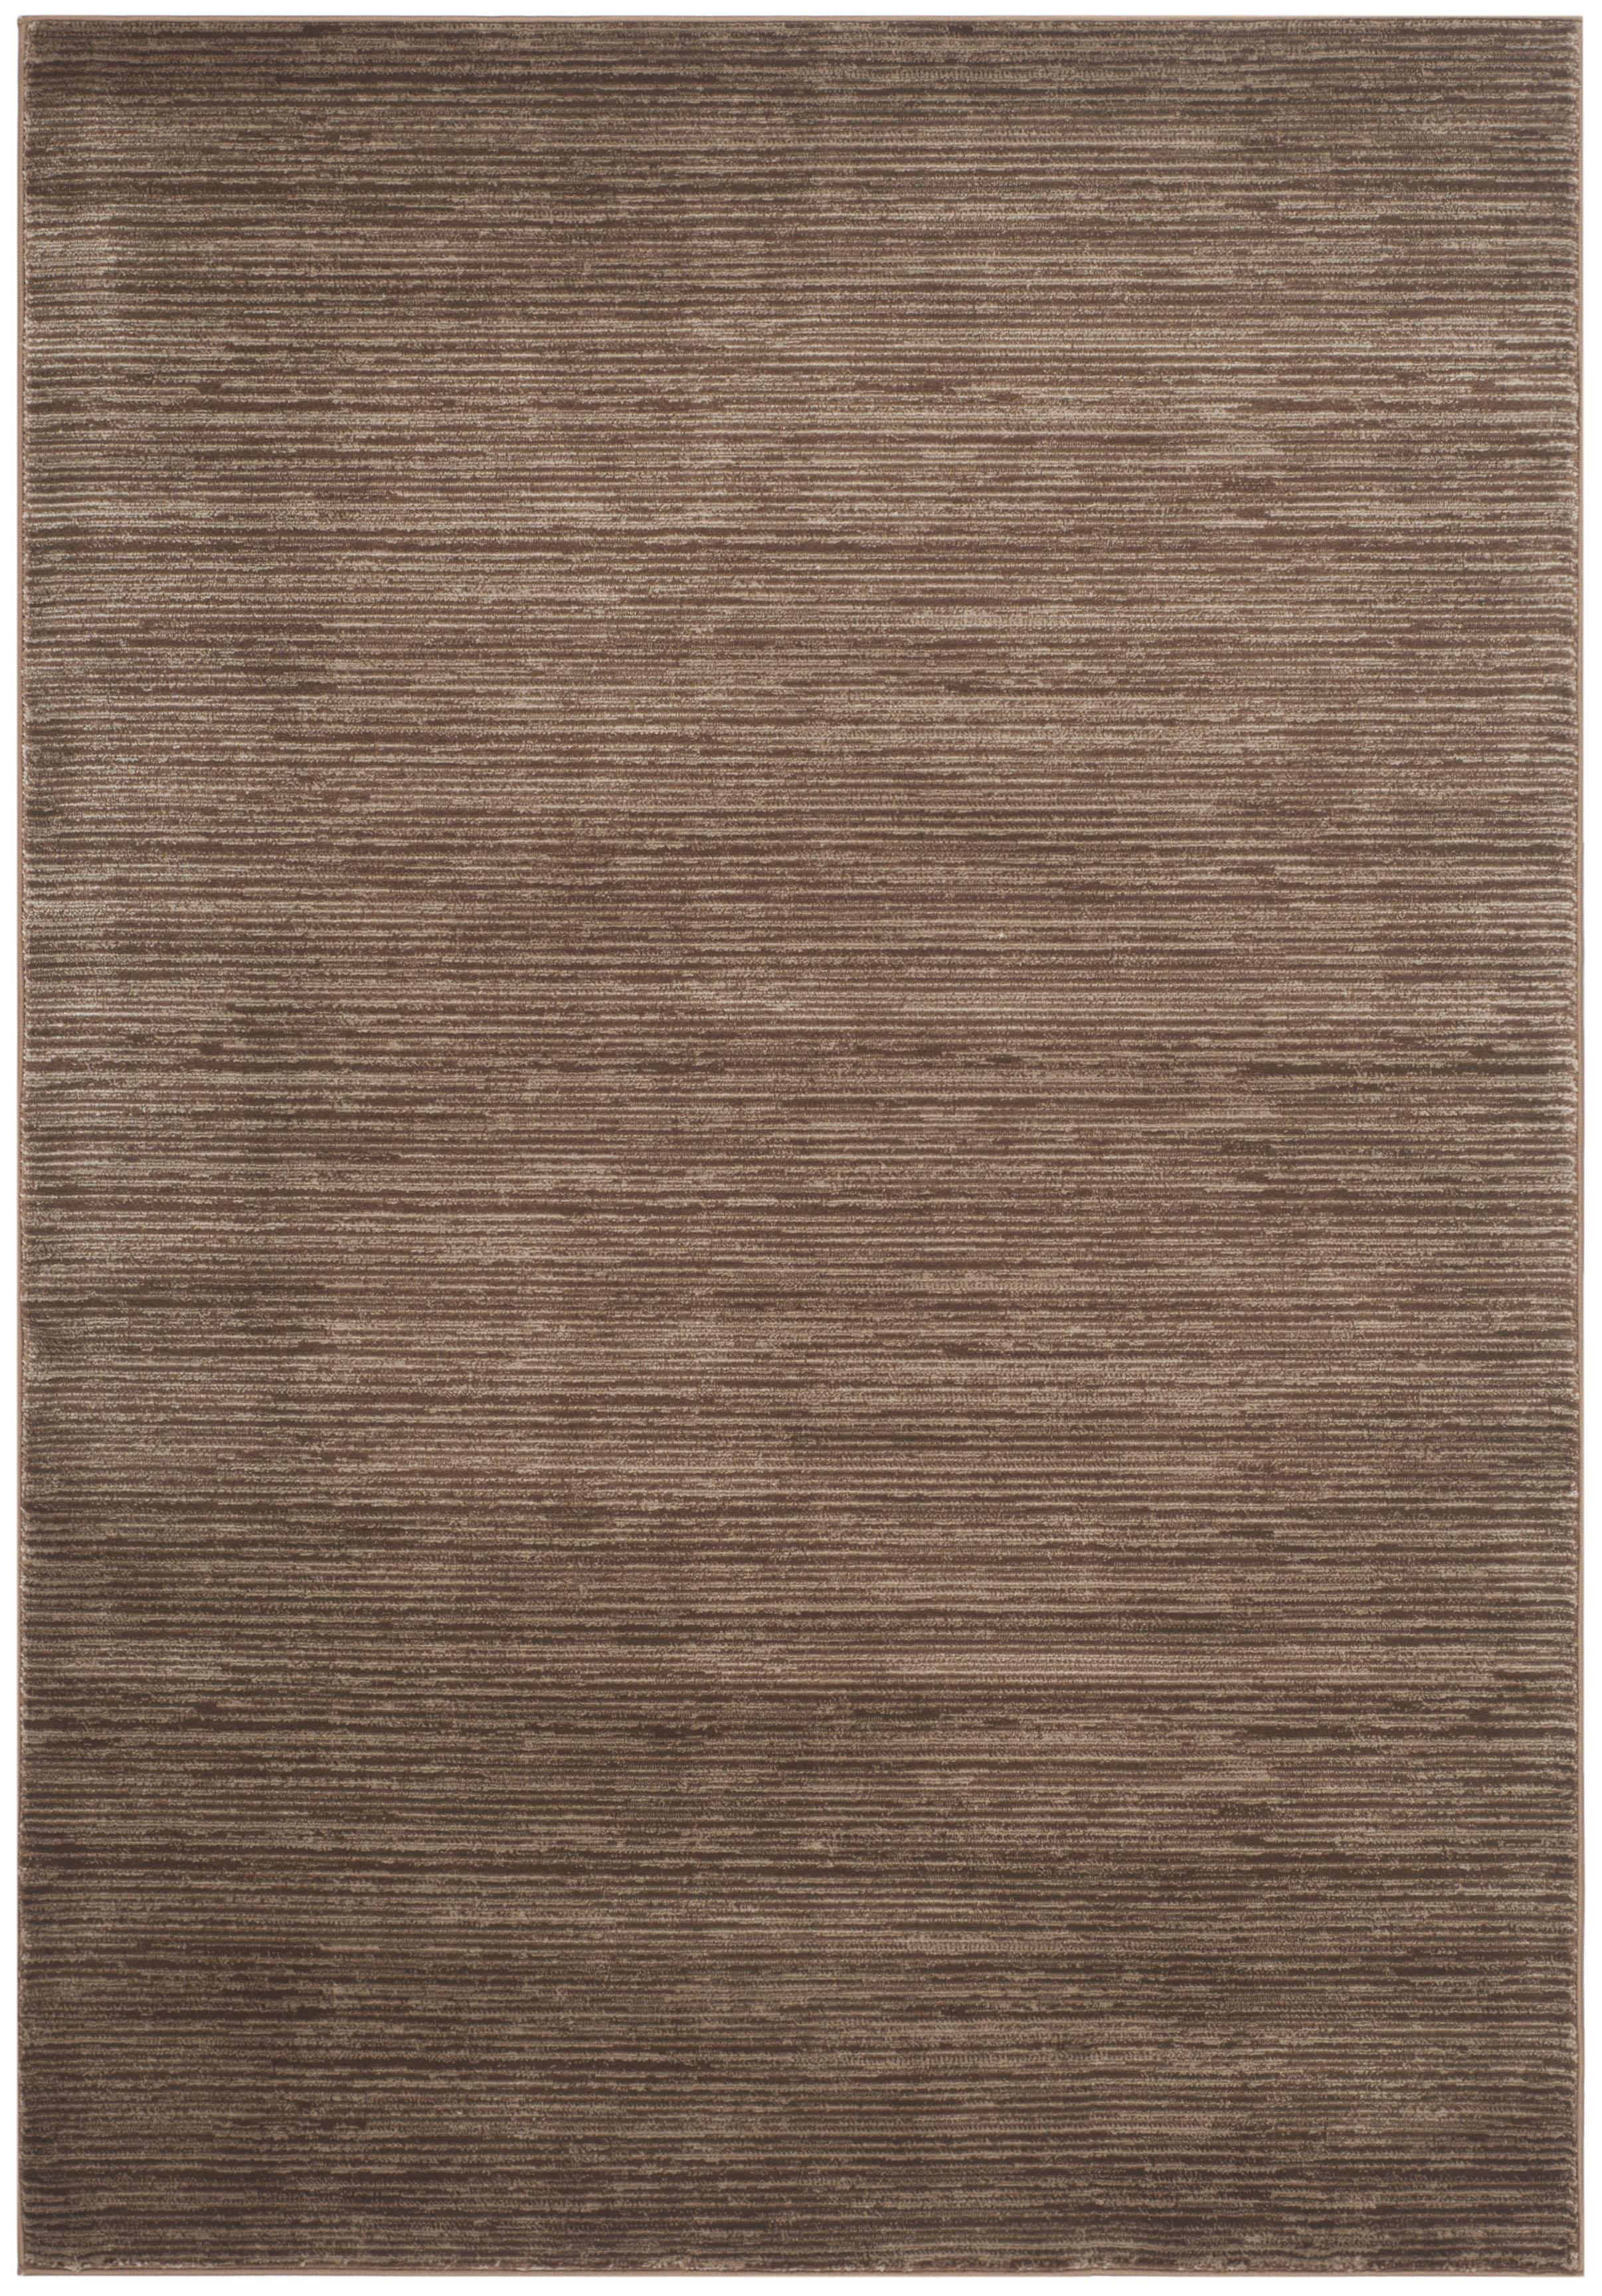 Tapis de salon contemporain marron 160x230